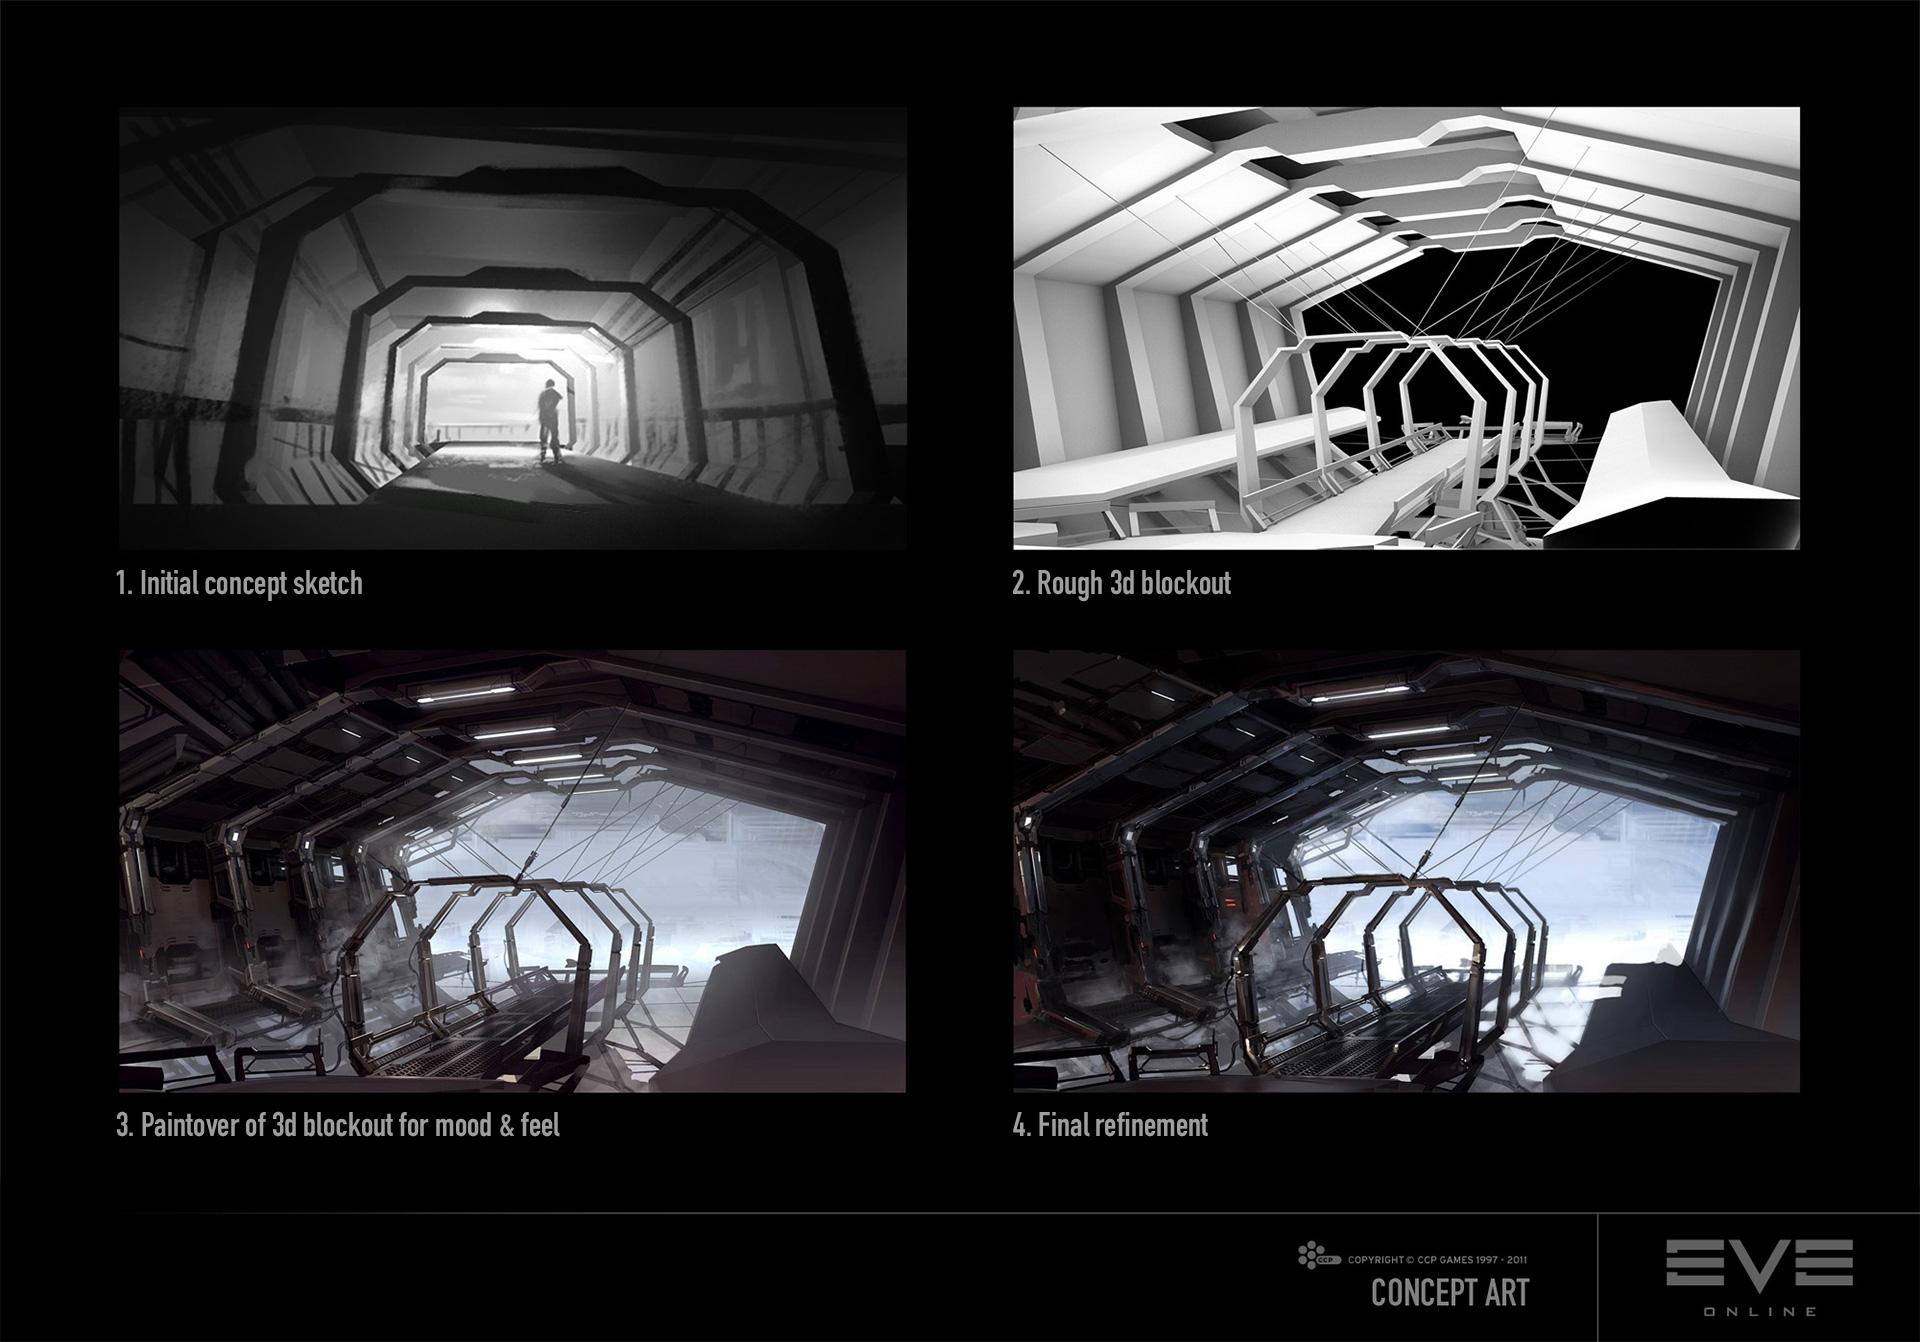 Schémas de conception de la passerelle